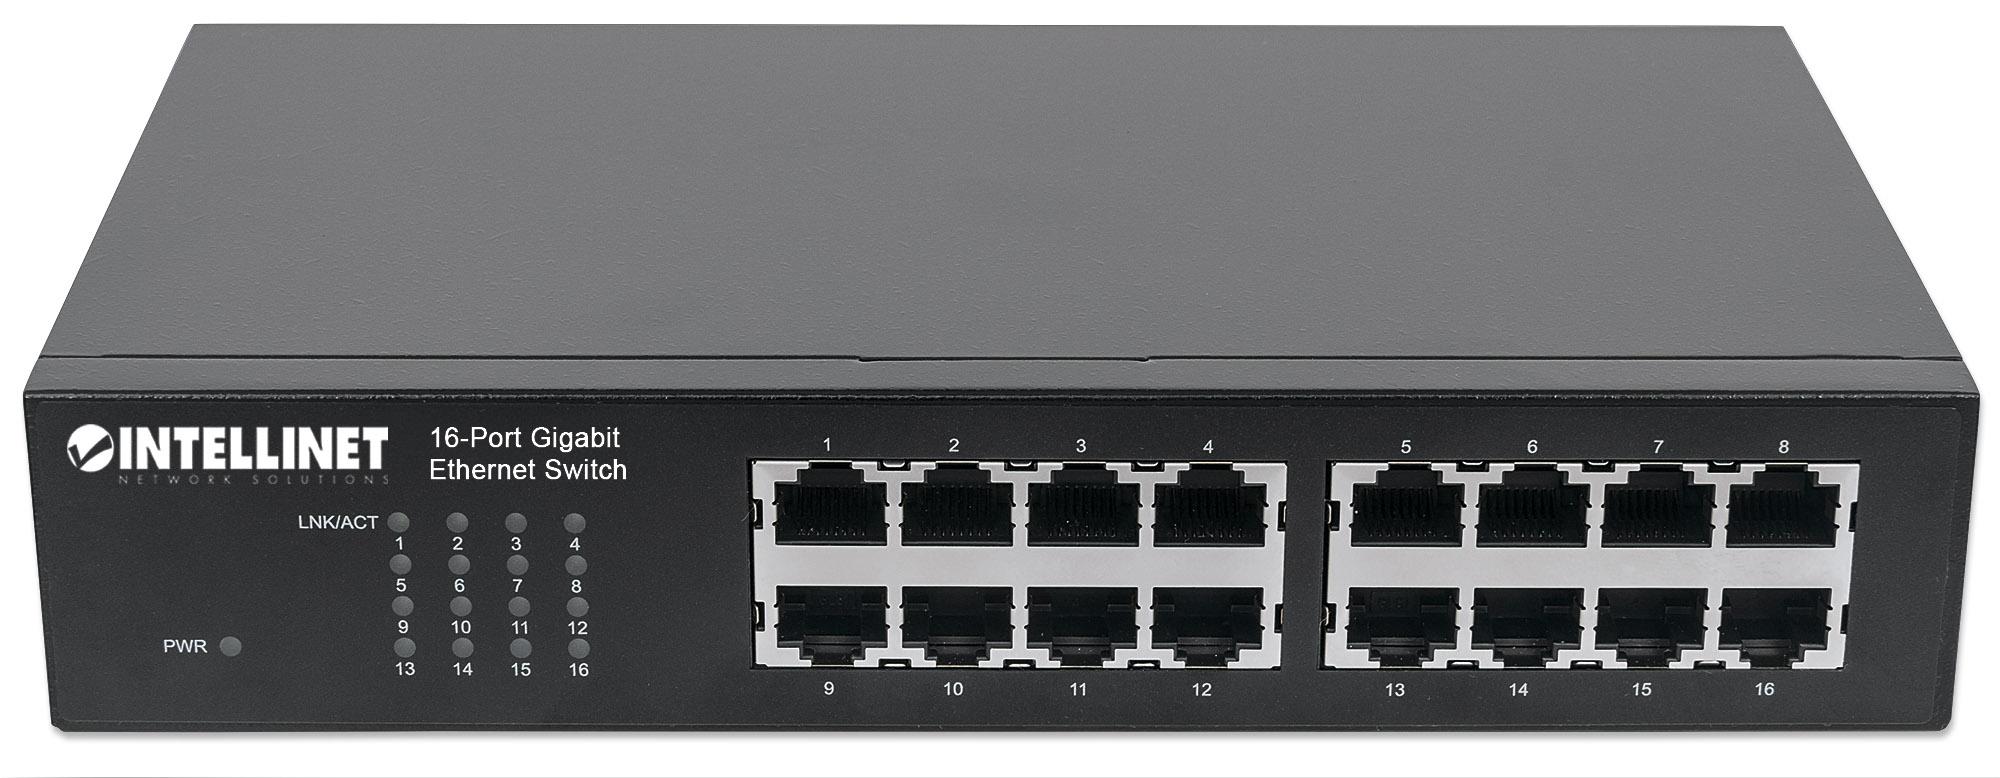 16-Port Gigabit Ethernet Switch